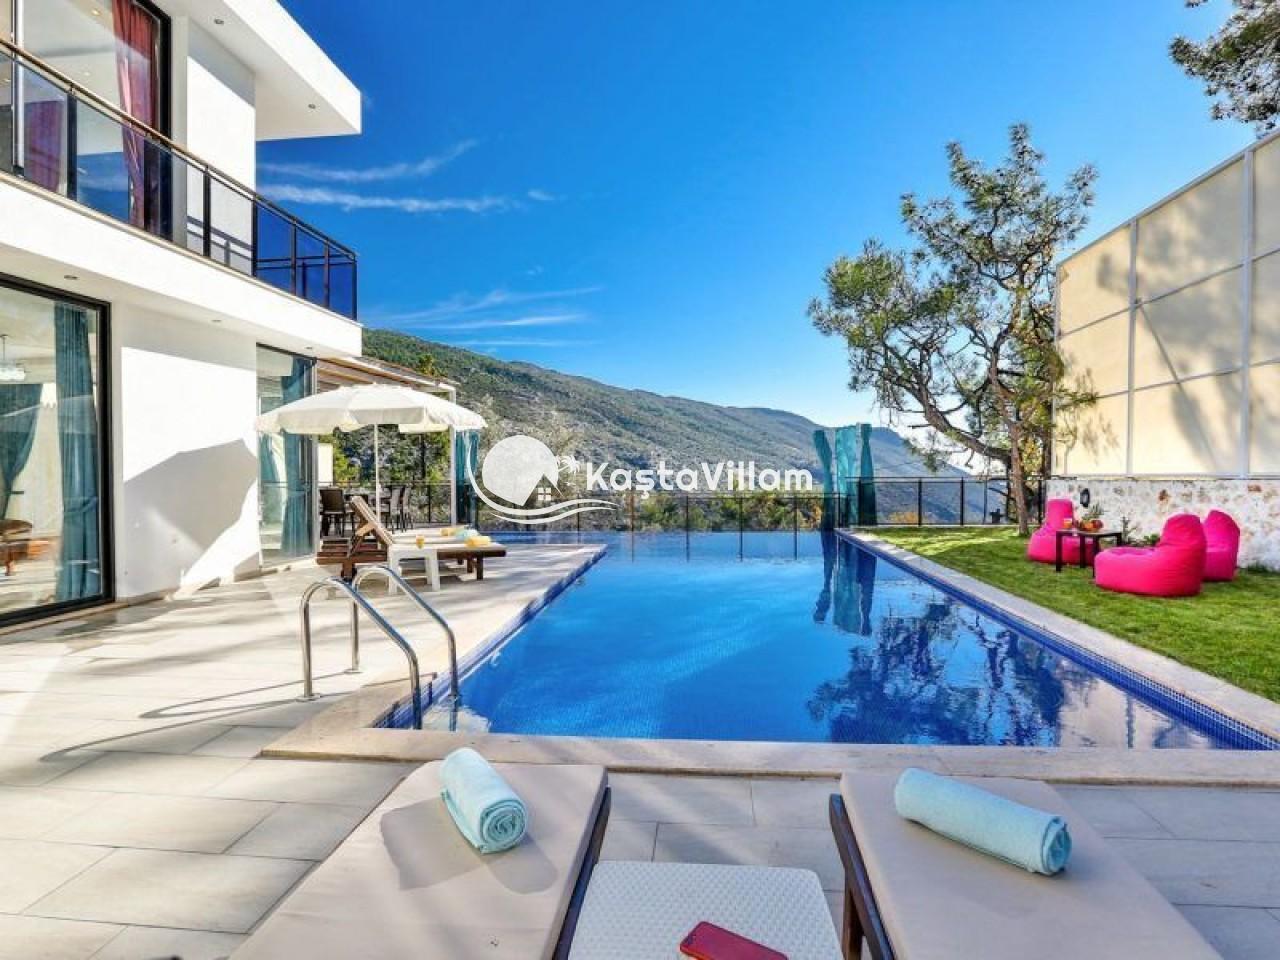 VİLLA SARI | Kaş Kiralık Villa, Kaş Yazlık Villa - Kaştavillam